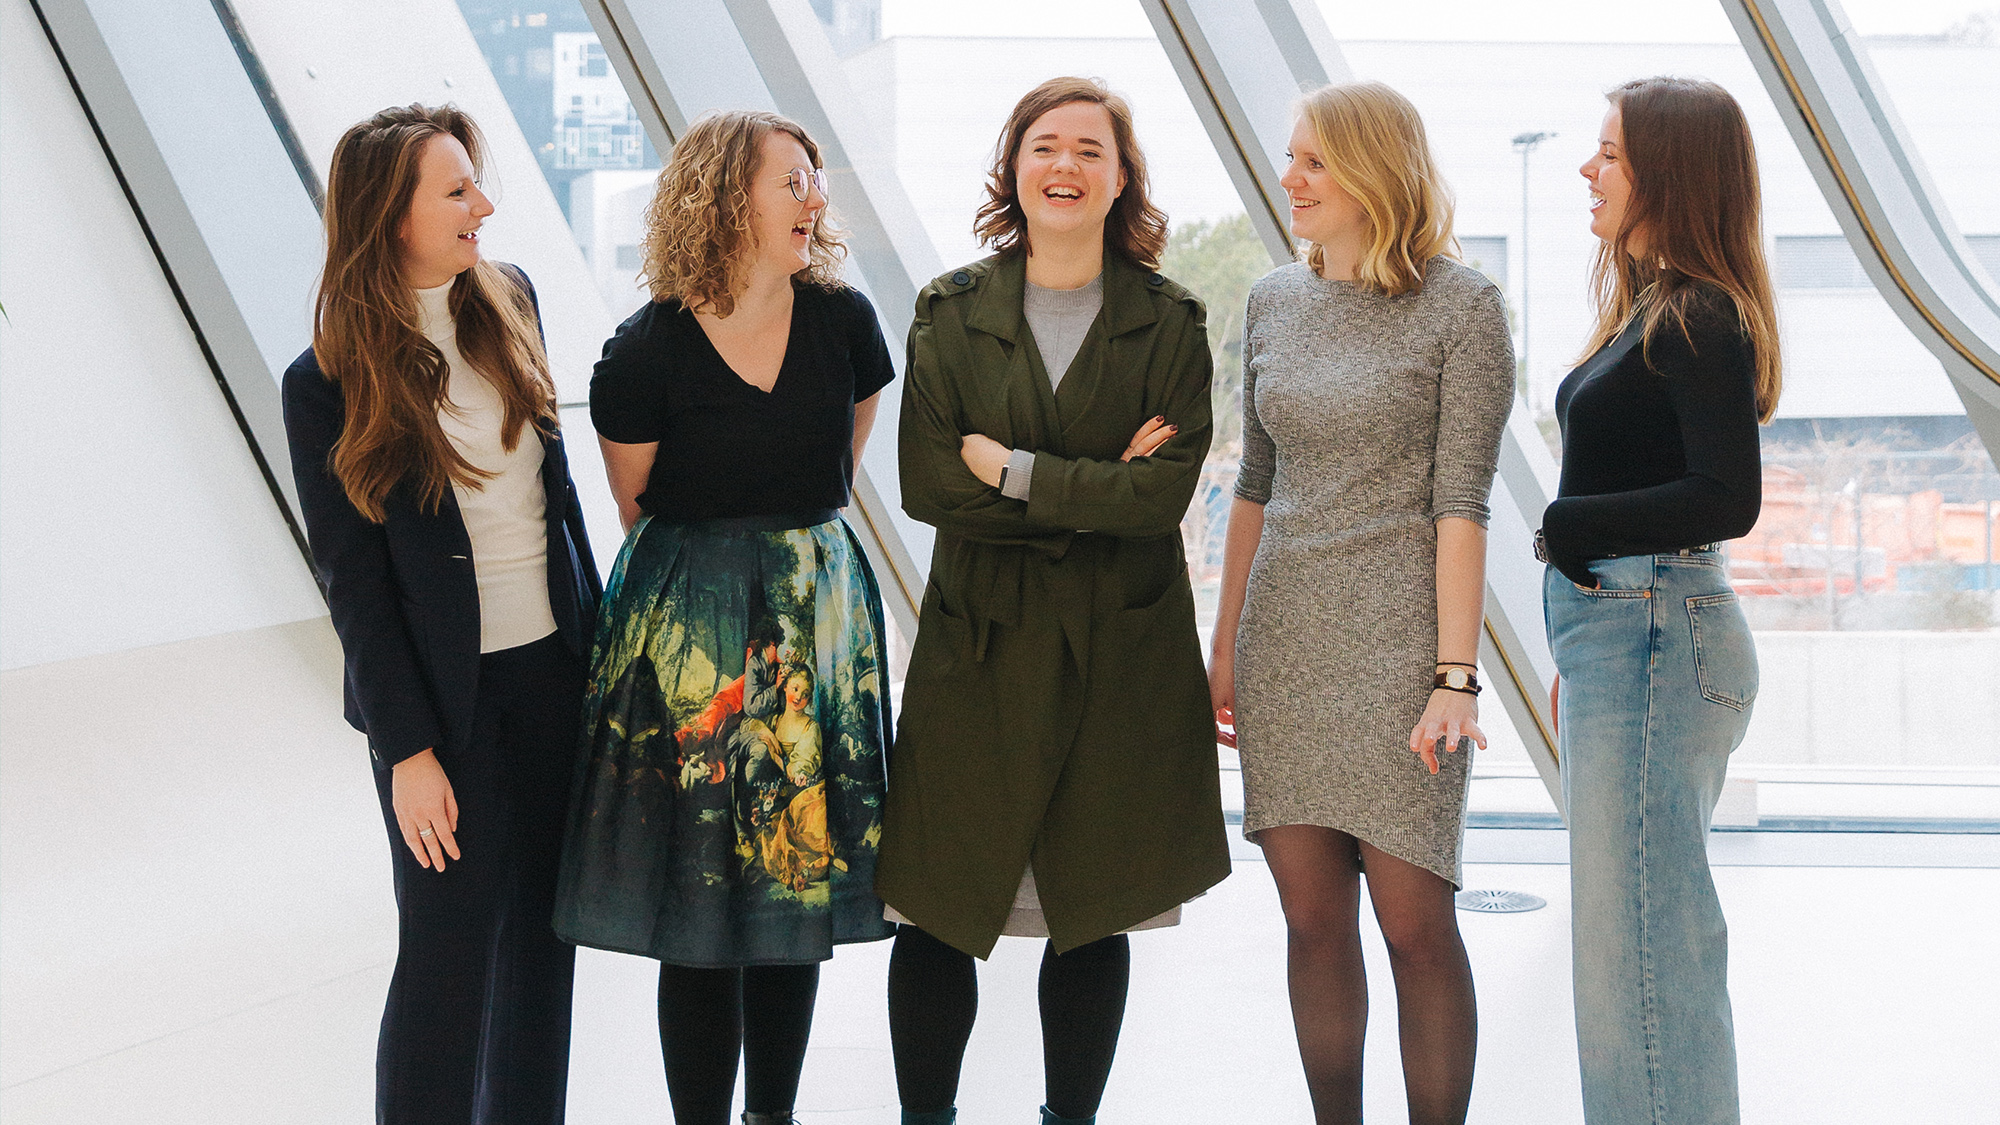 Das Team von Female Founders. © Female Founders